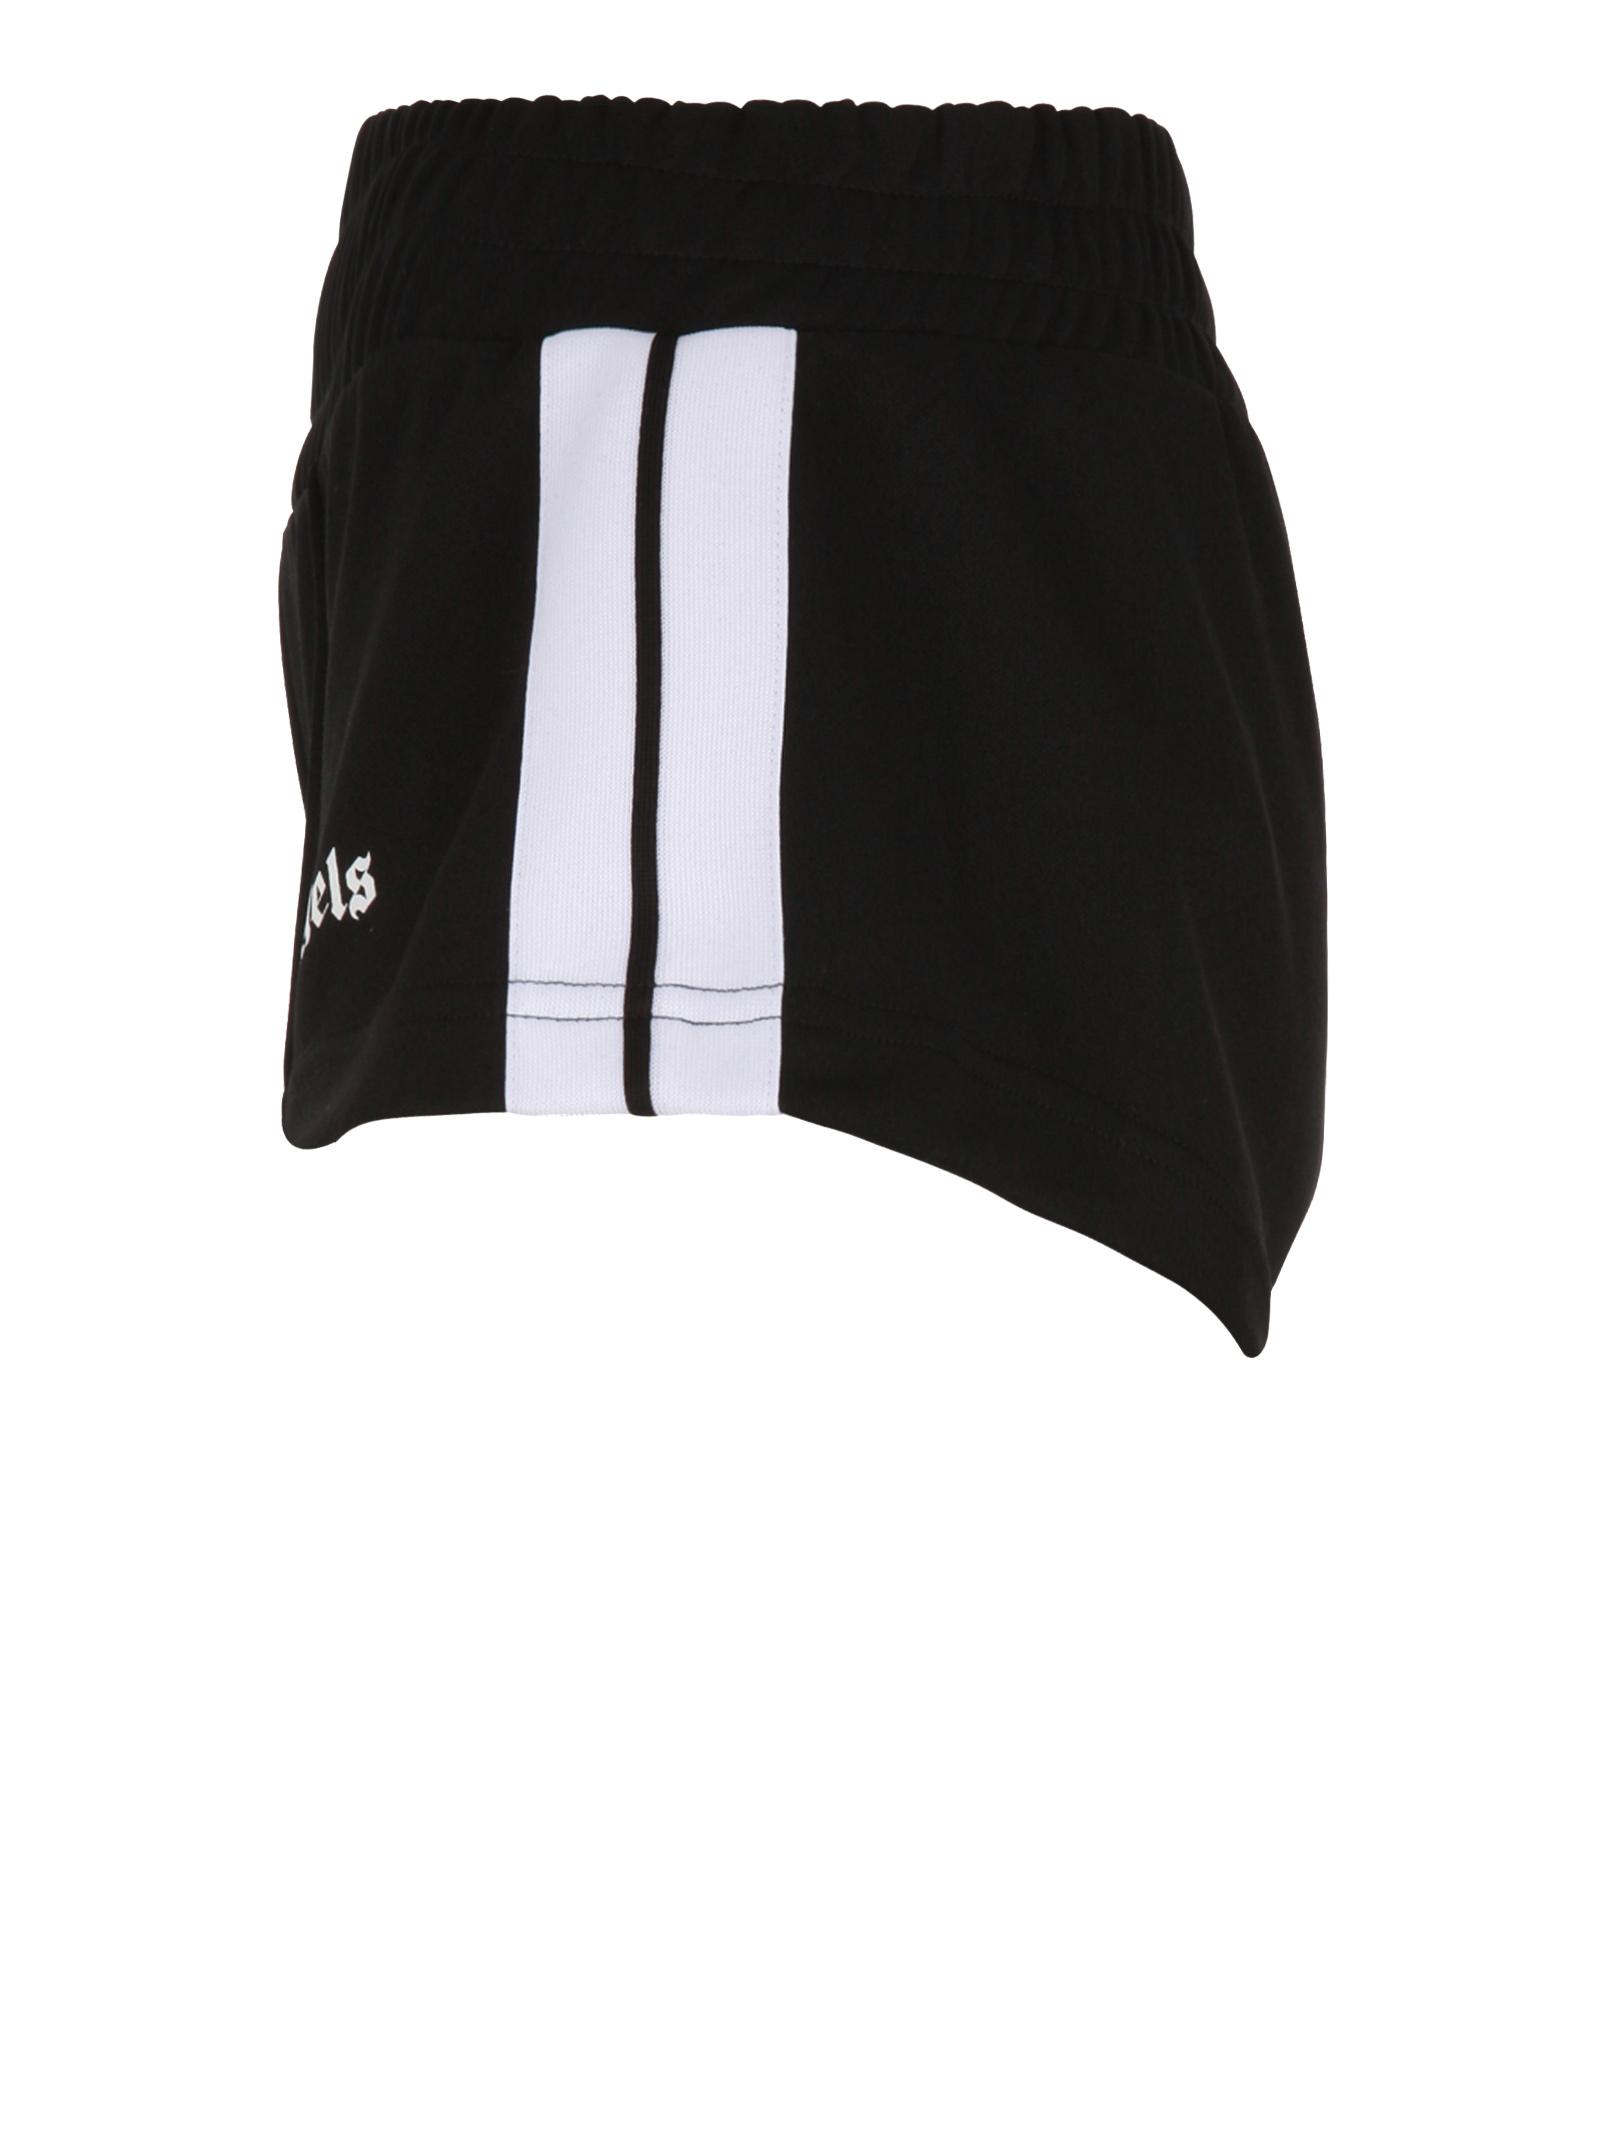 451b4e58e2 Palm Angels shorts - Palm Angels - Michele Franzese Moda